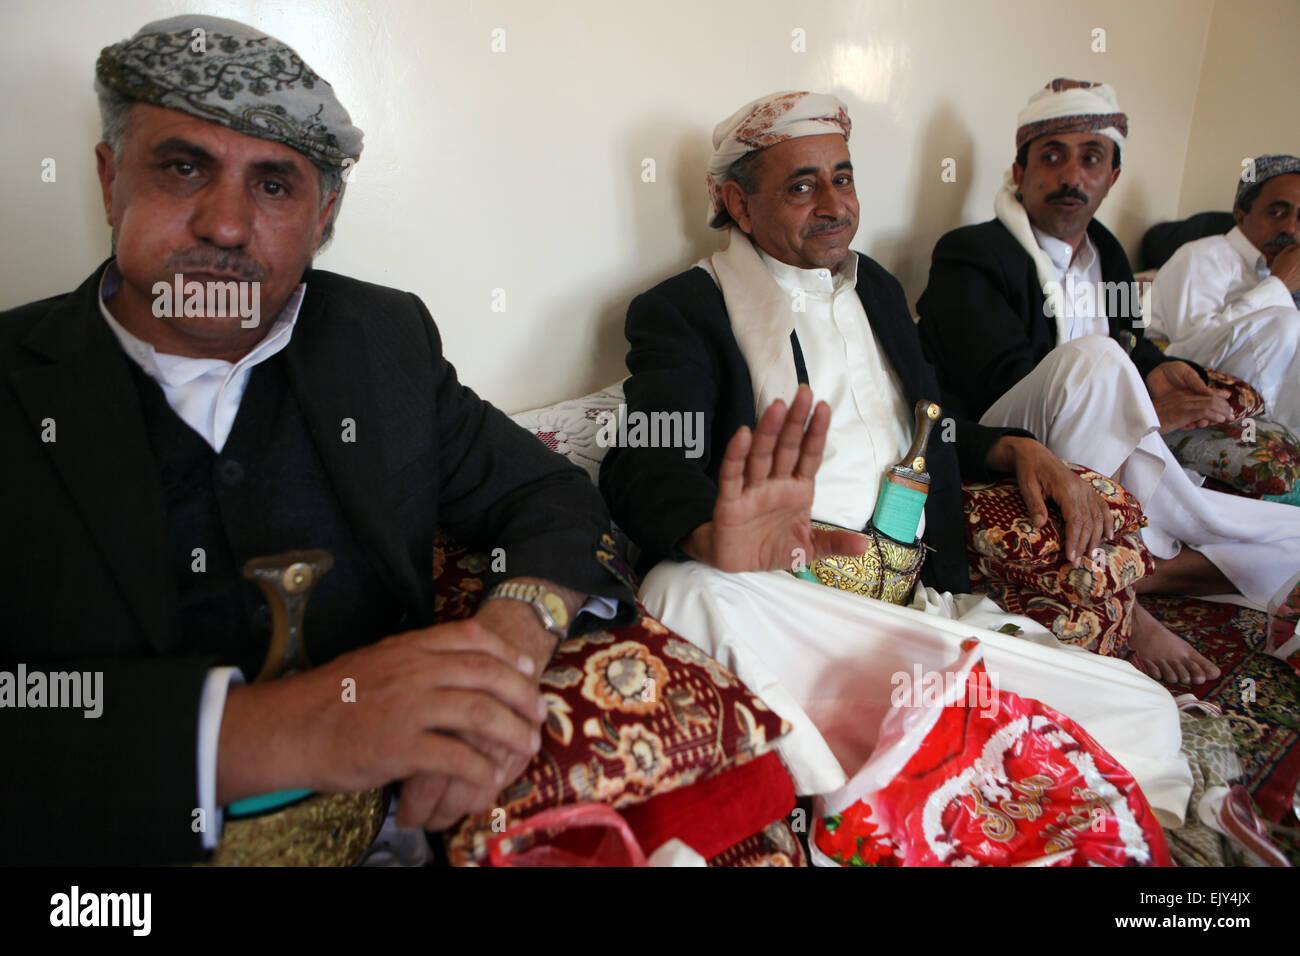 A wedding in Al Manakha, Yemen. - Stock Image